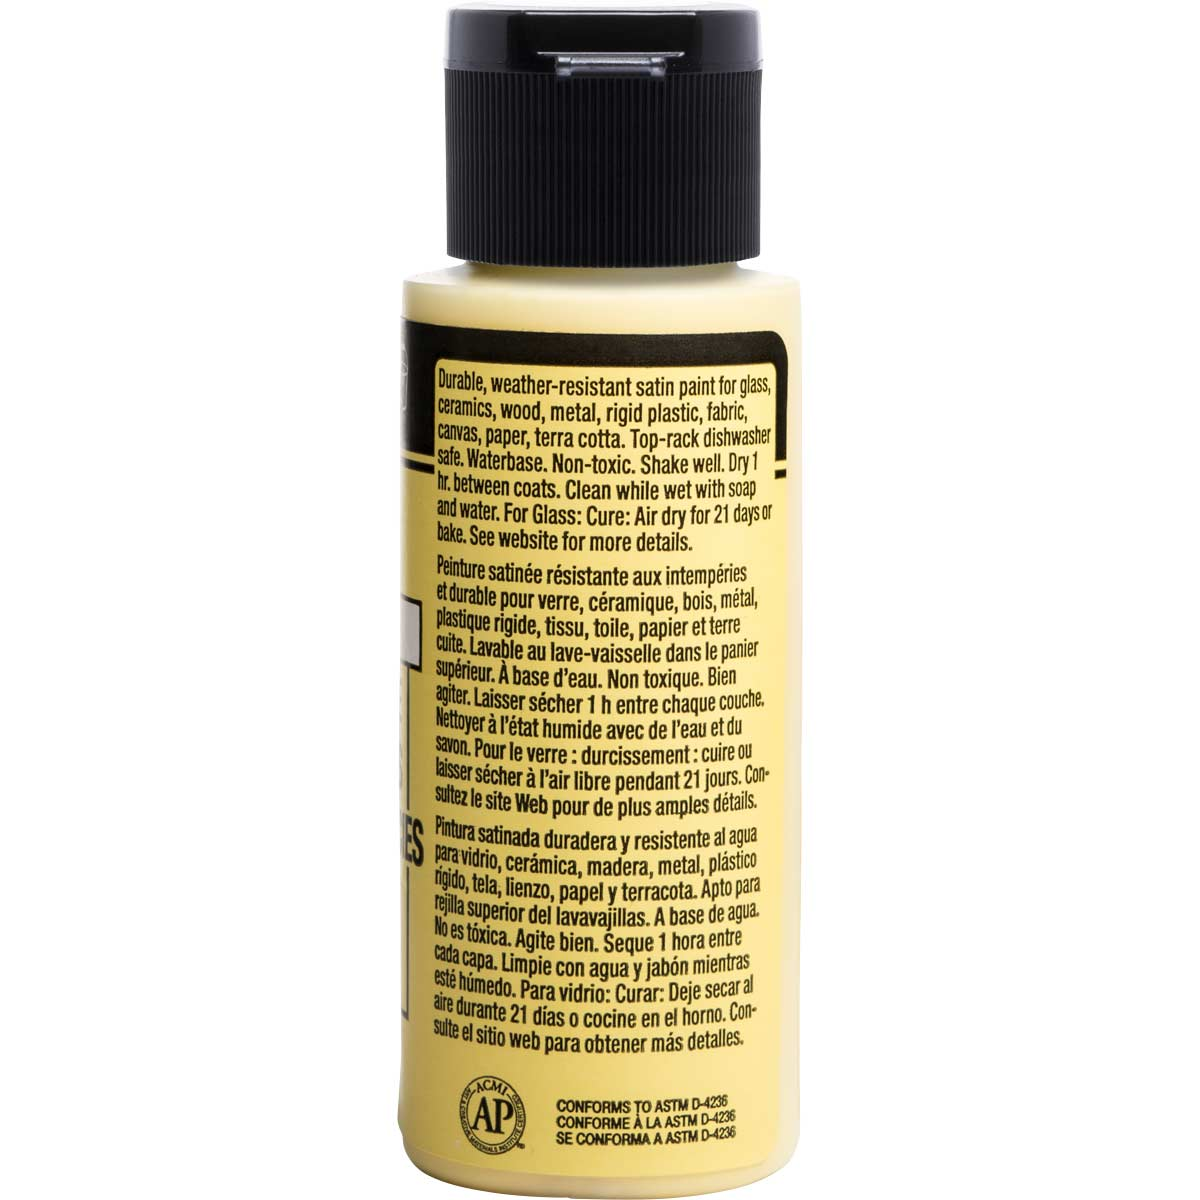 FolkArt ® Multi-Surface Satin Acrylic Paints - Pale Yellow, 2 oz.